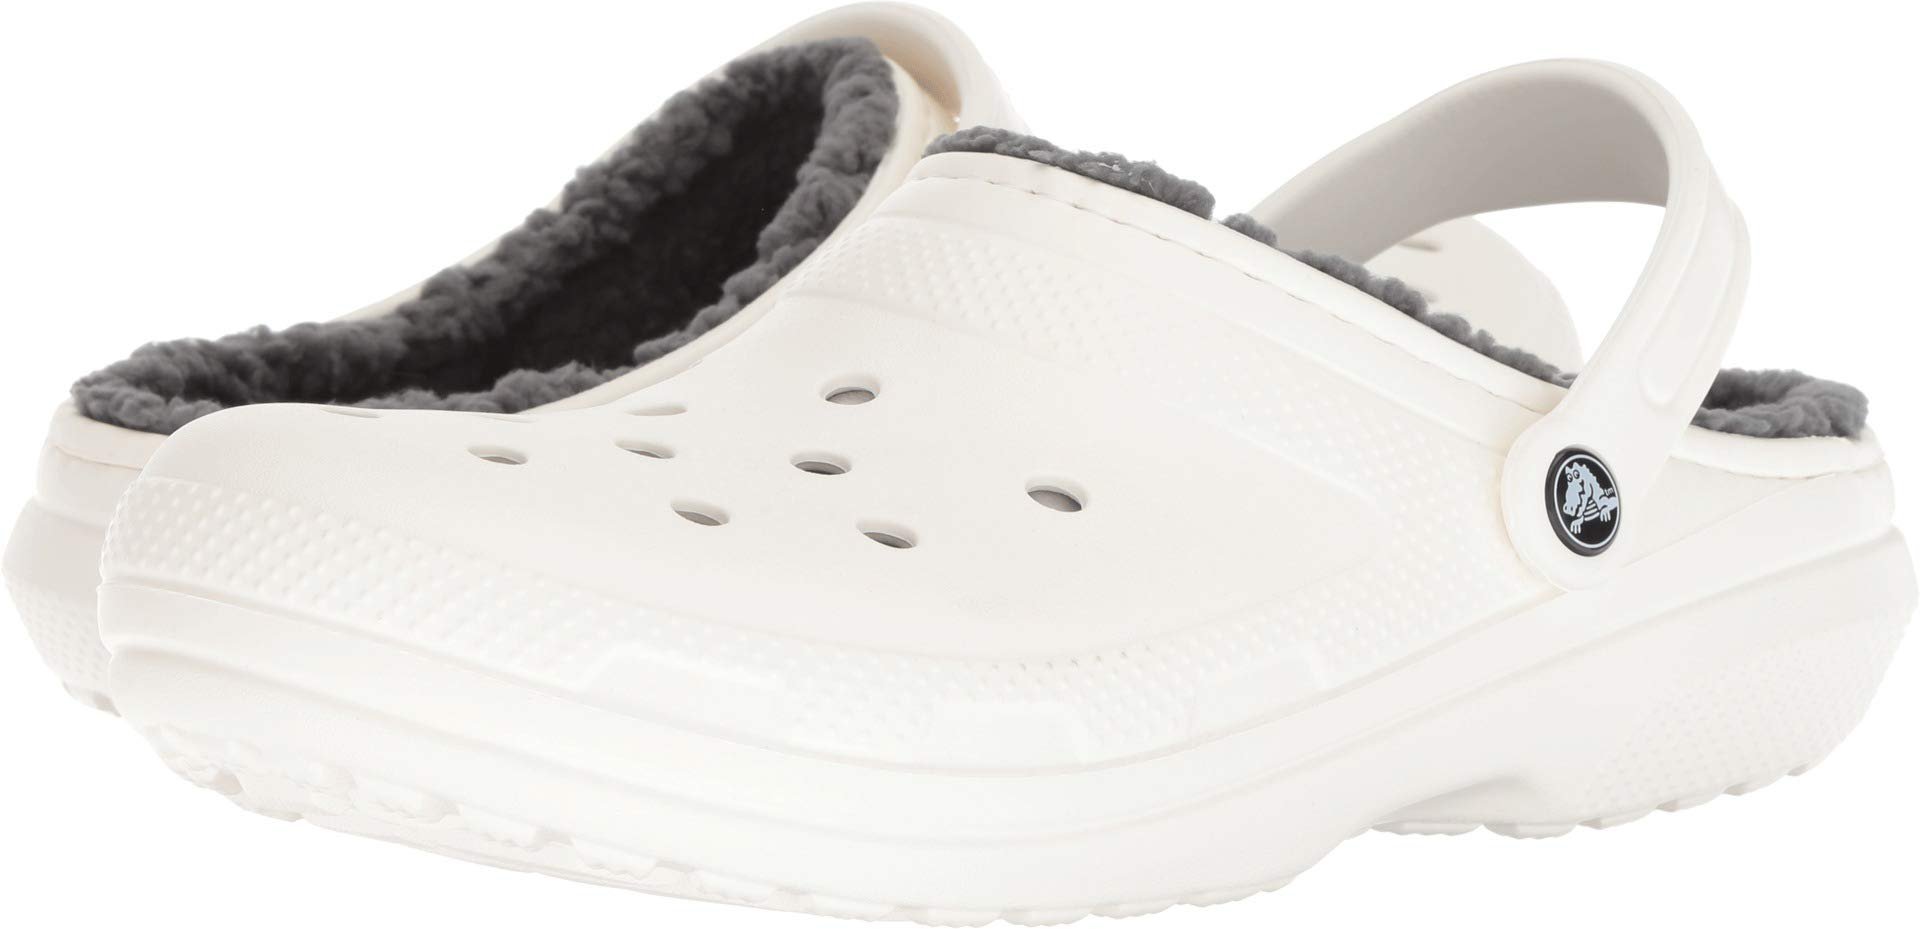 Crocs Unisex Classic Lined Clog White/Grey 9 Women / 7 Men M US Medium